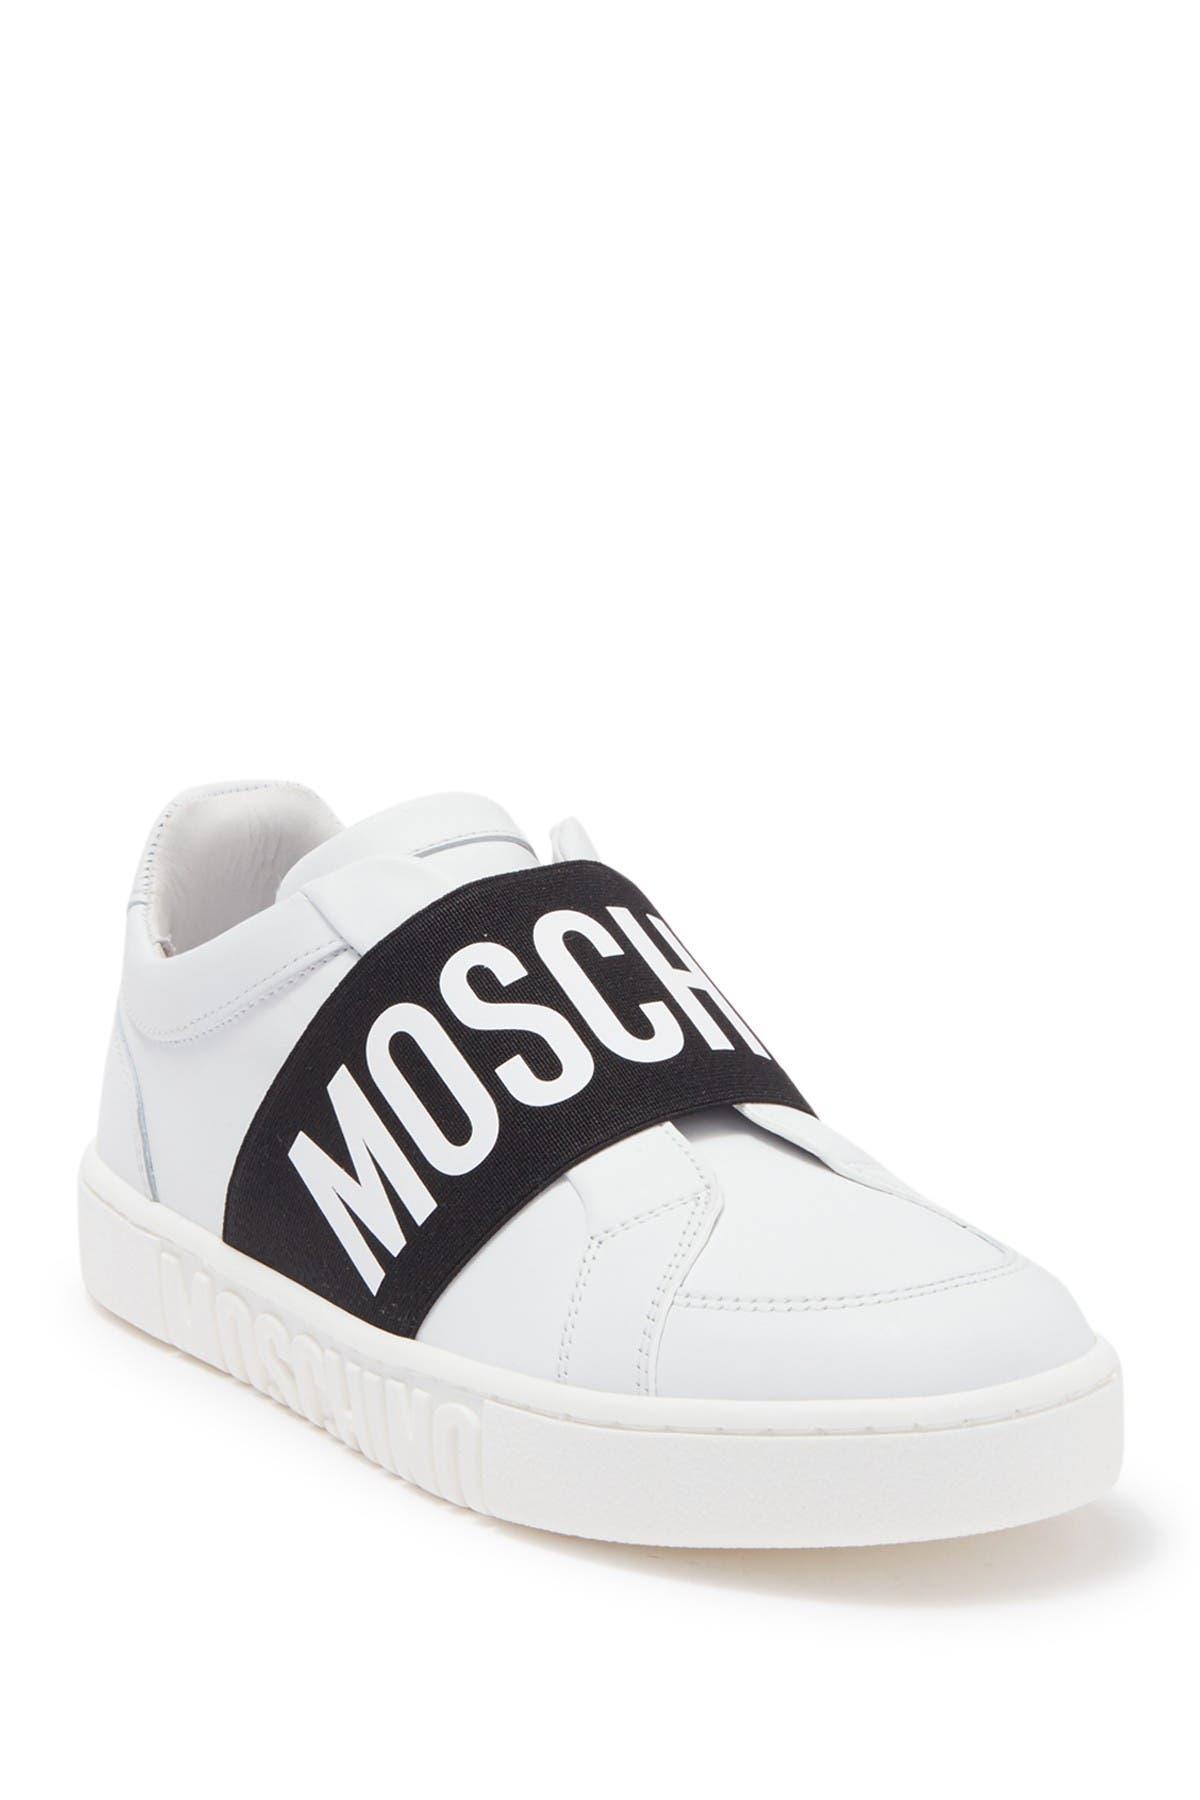 Image of MOSCHINO Logo Strap Slip-On Sneaker